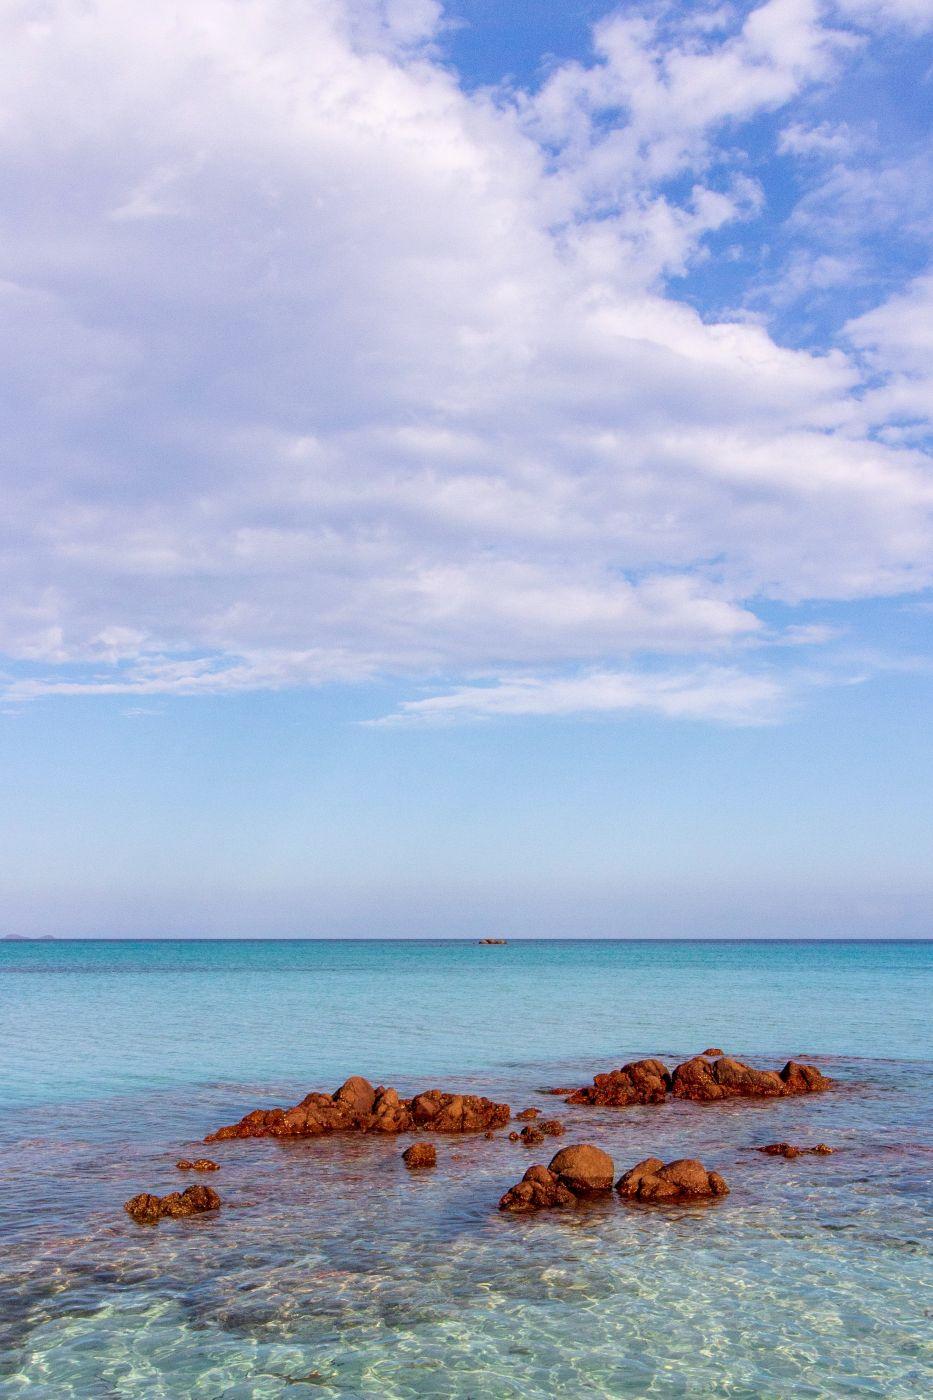 Santa Giulia Beach in Corsica, France